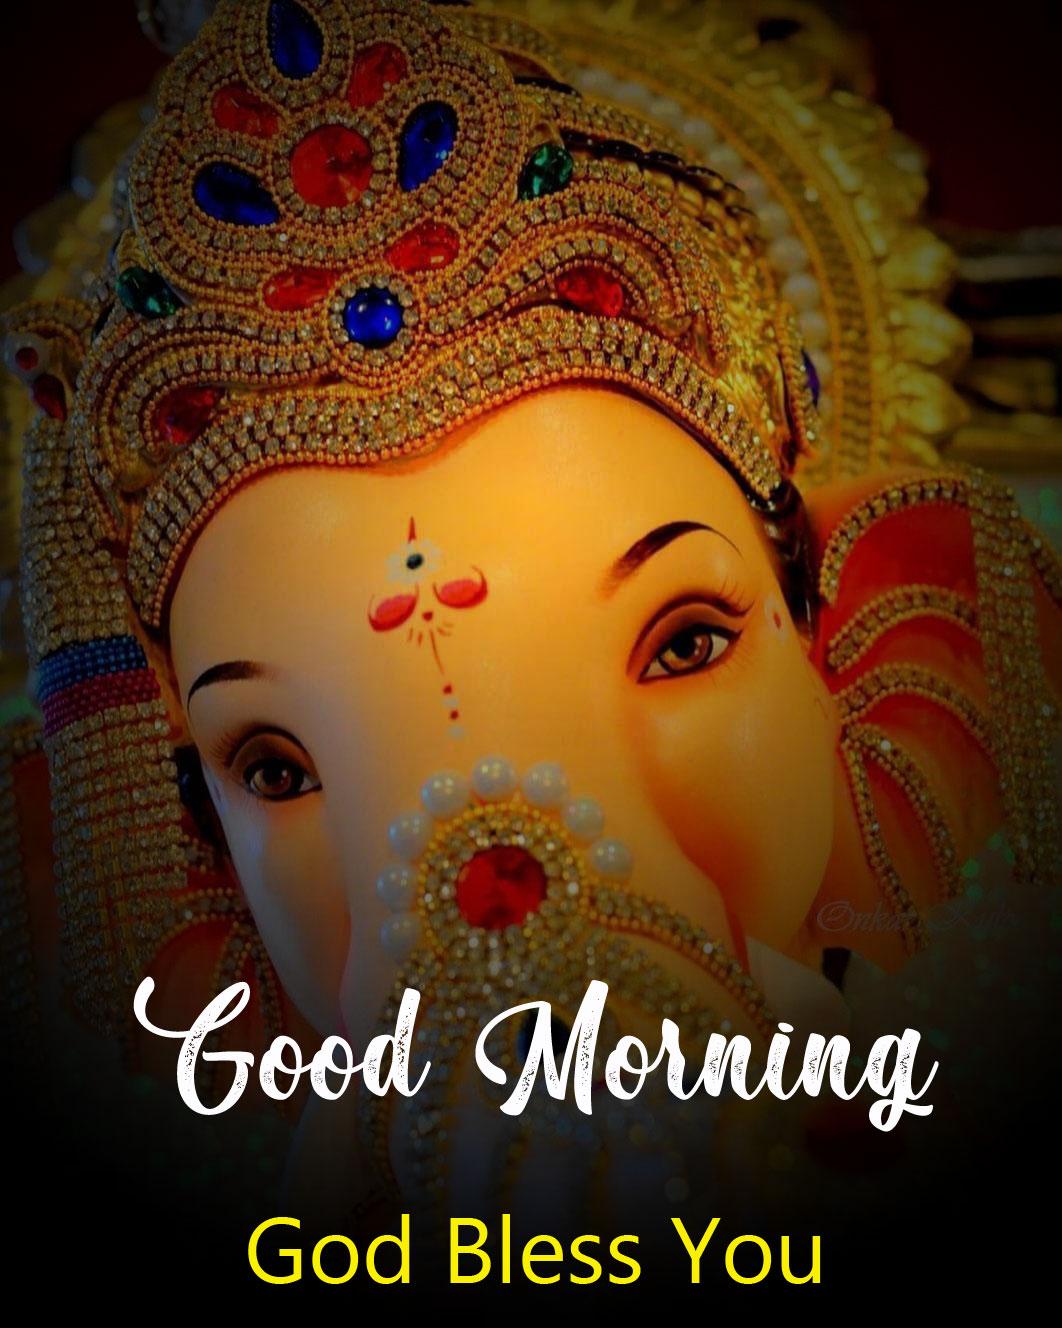 ganesha good morning images for insta